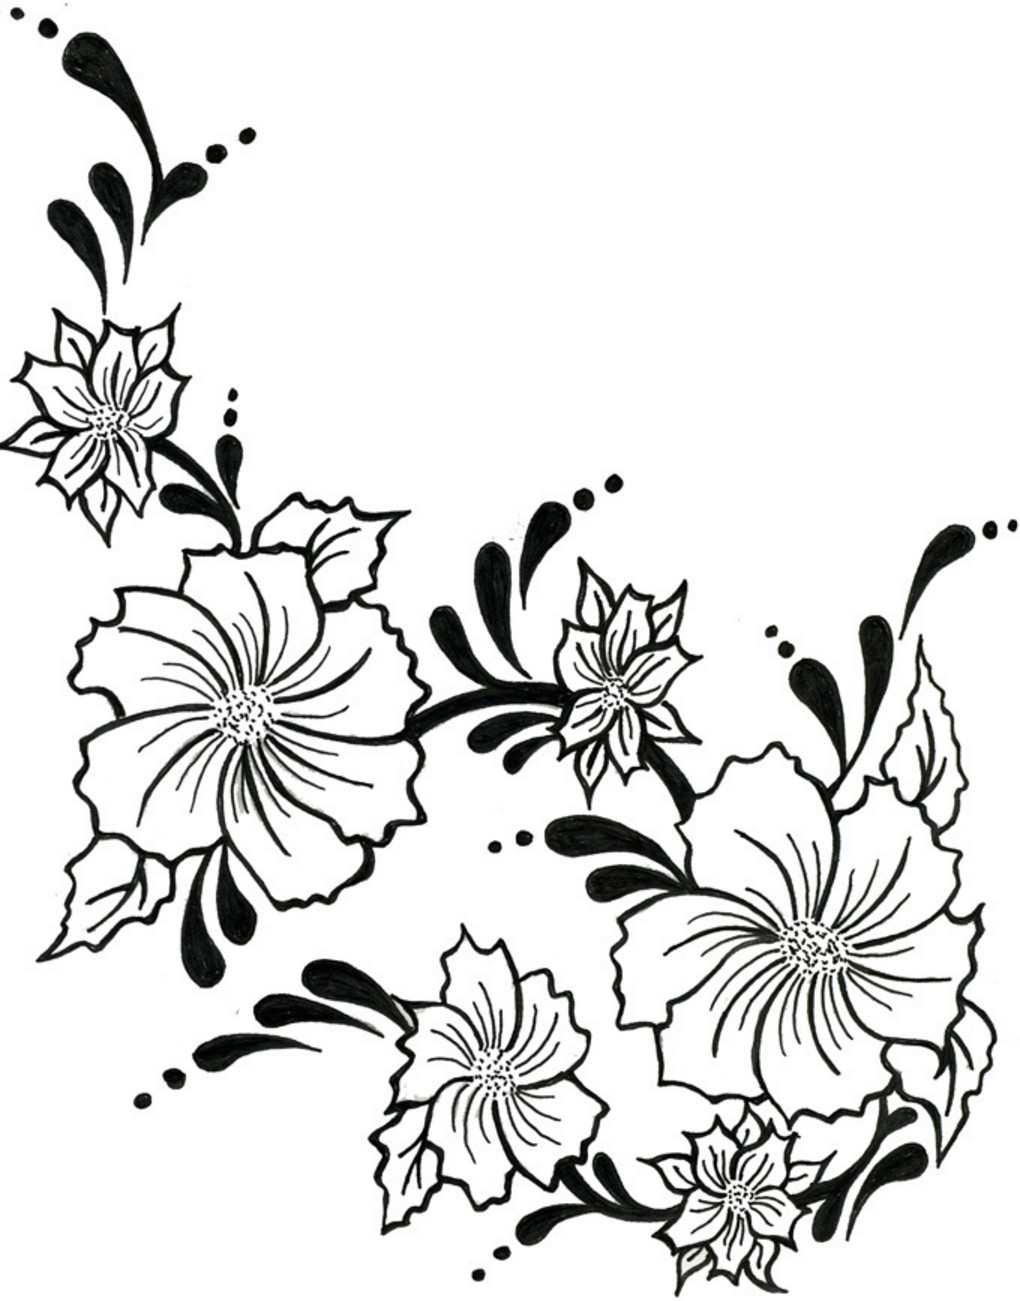 Drawn vine artistic #9